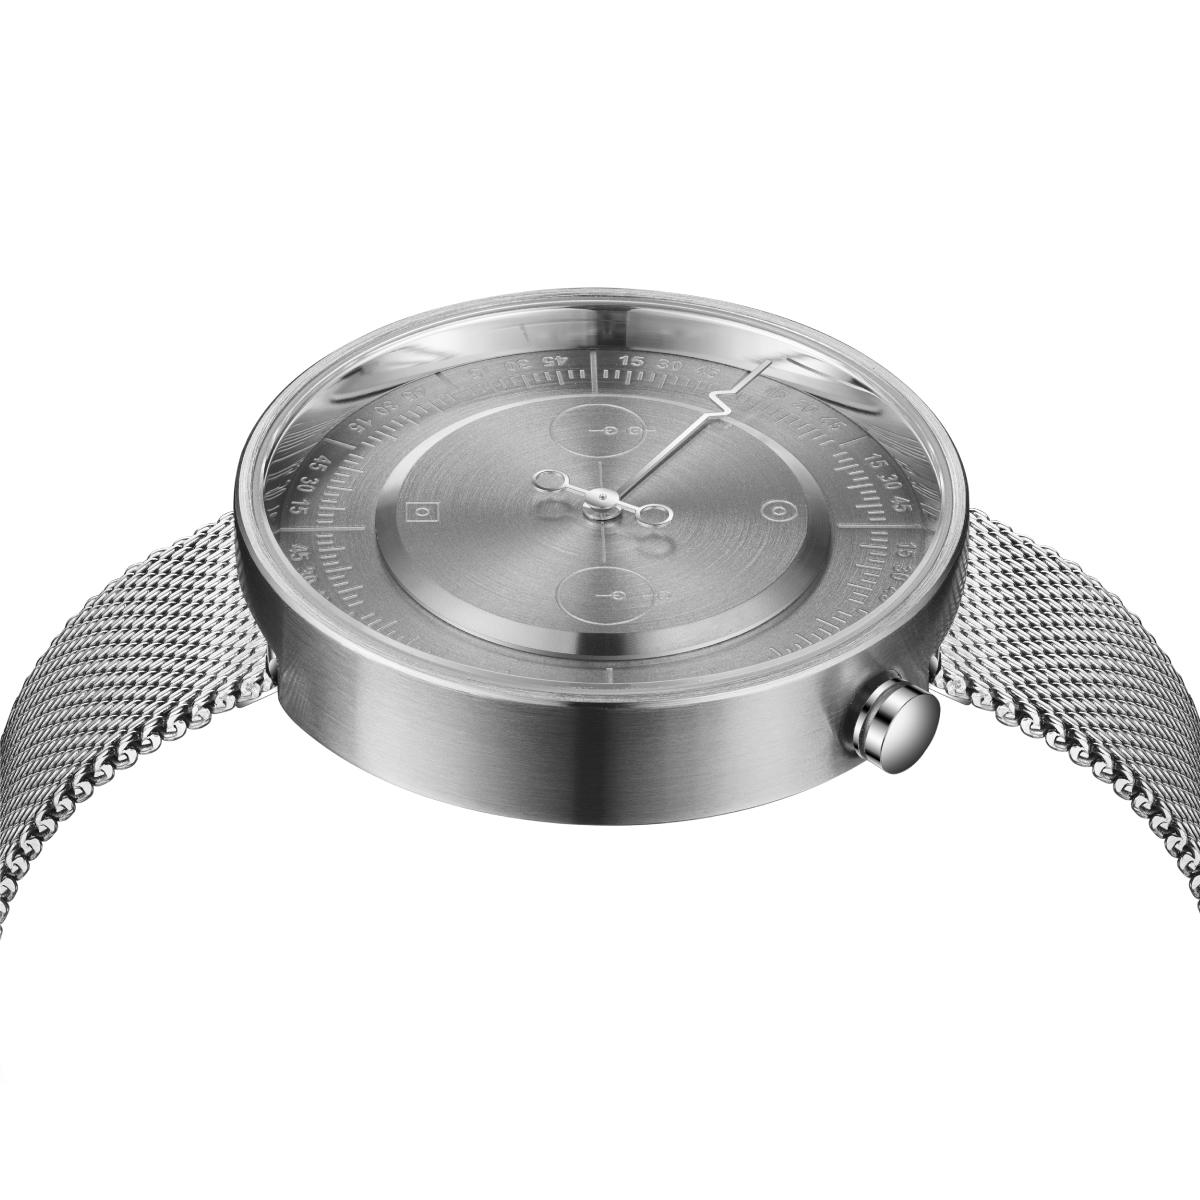 003 ULTRAWORKS 手表男女时尚简约钢带腕表原创个姓小众石英表 系列